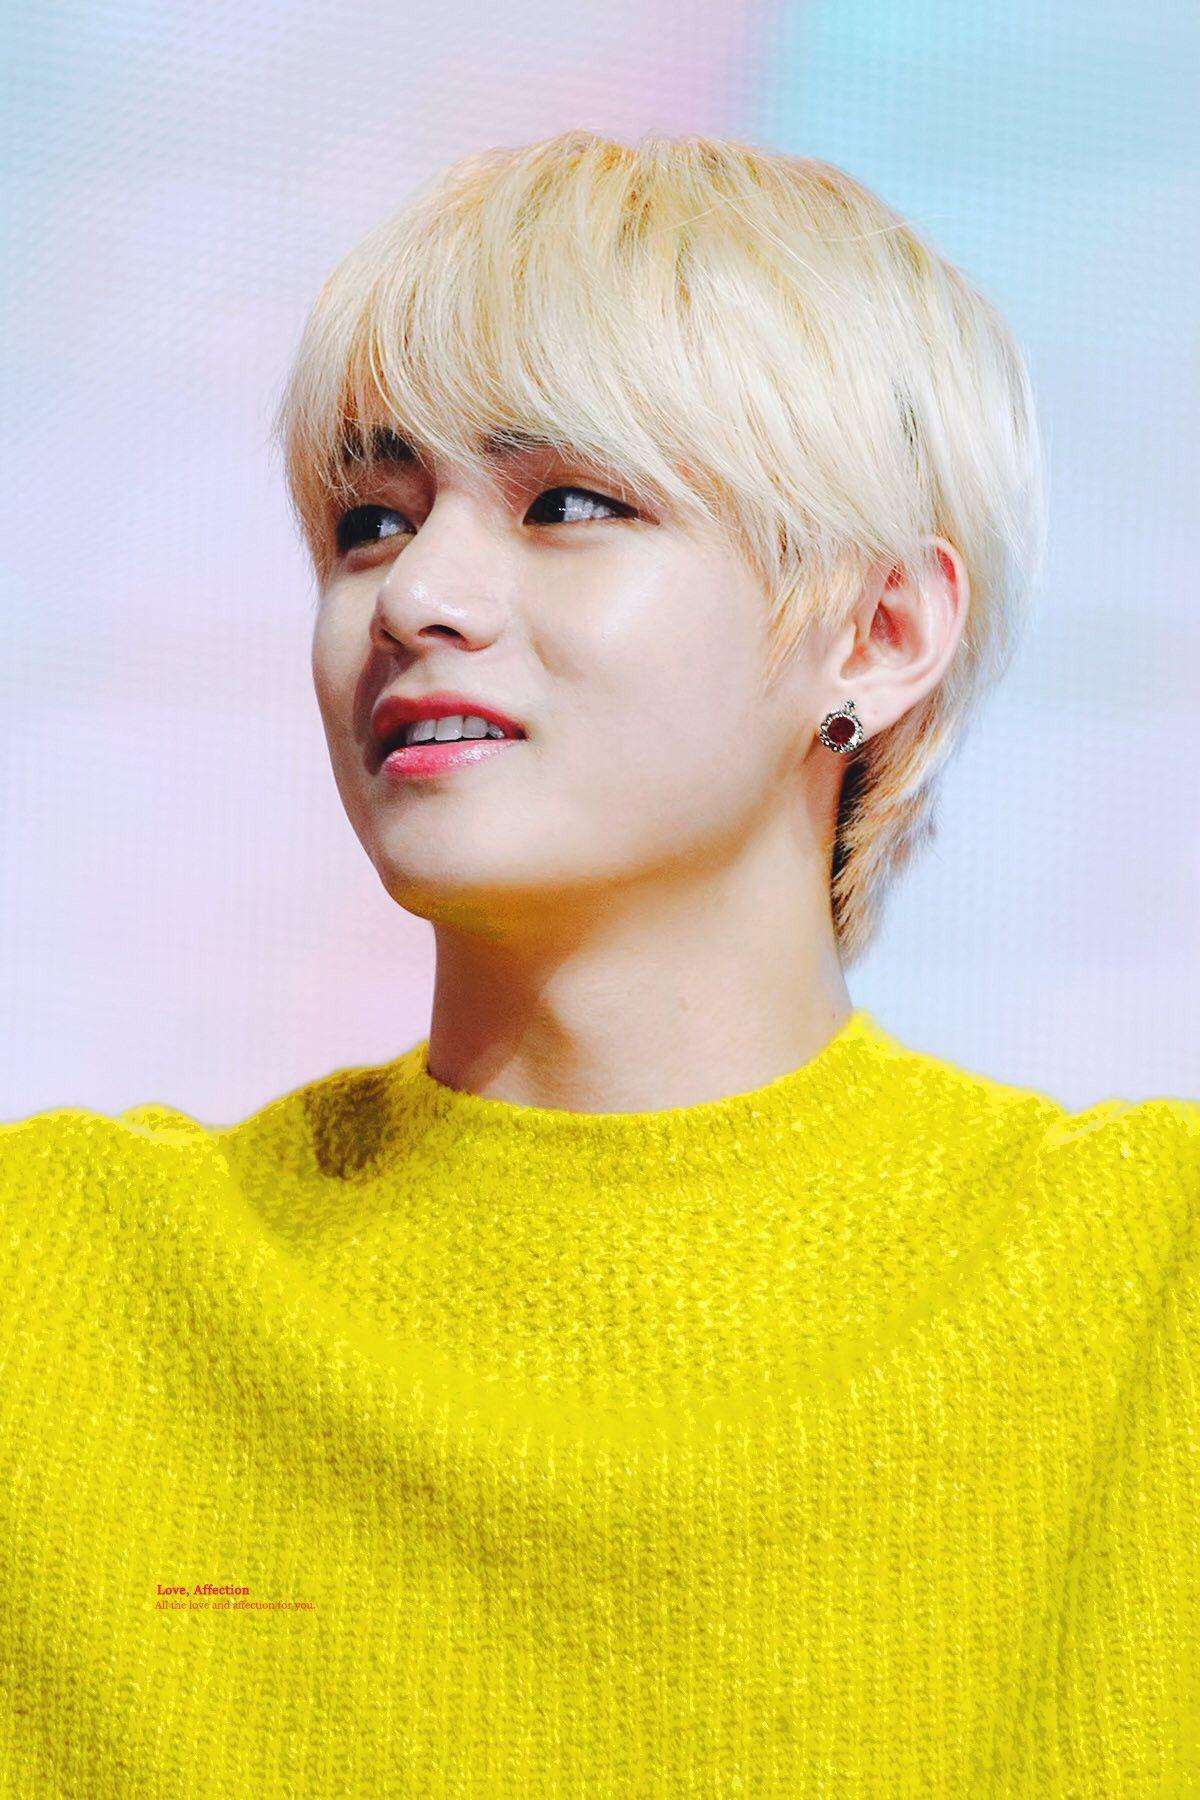 taehyung kim bts yellow namjoon gda korean tae allforbts soft jung hoseok jimin asiaticos garotos awards golden icons edit visit